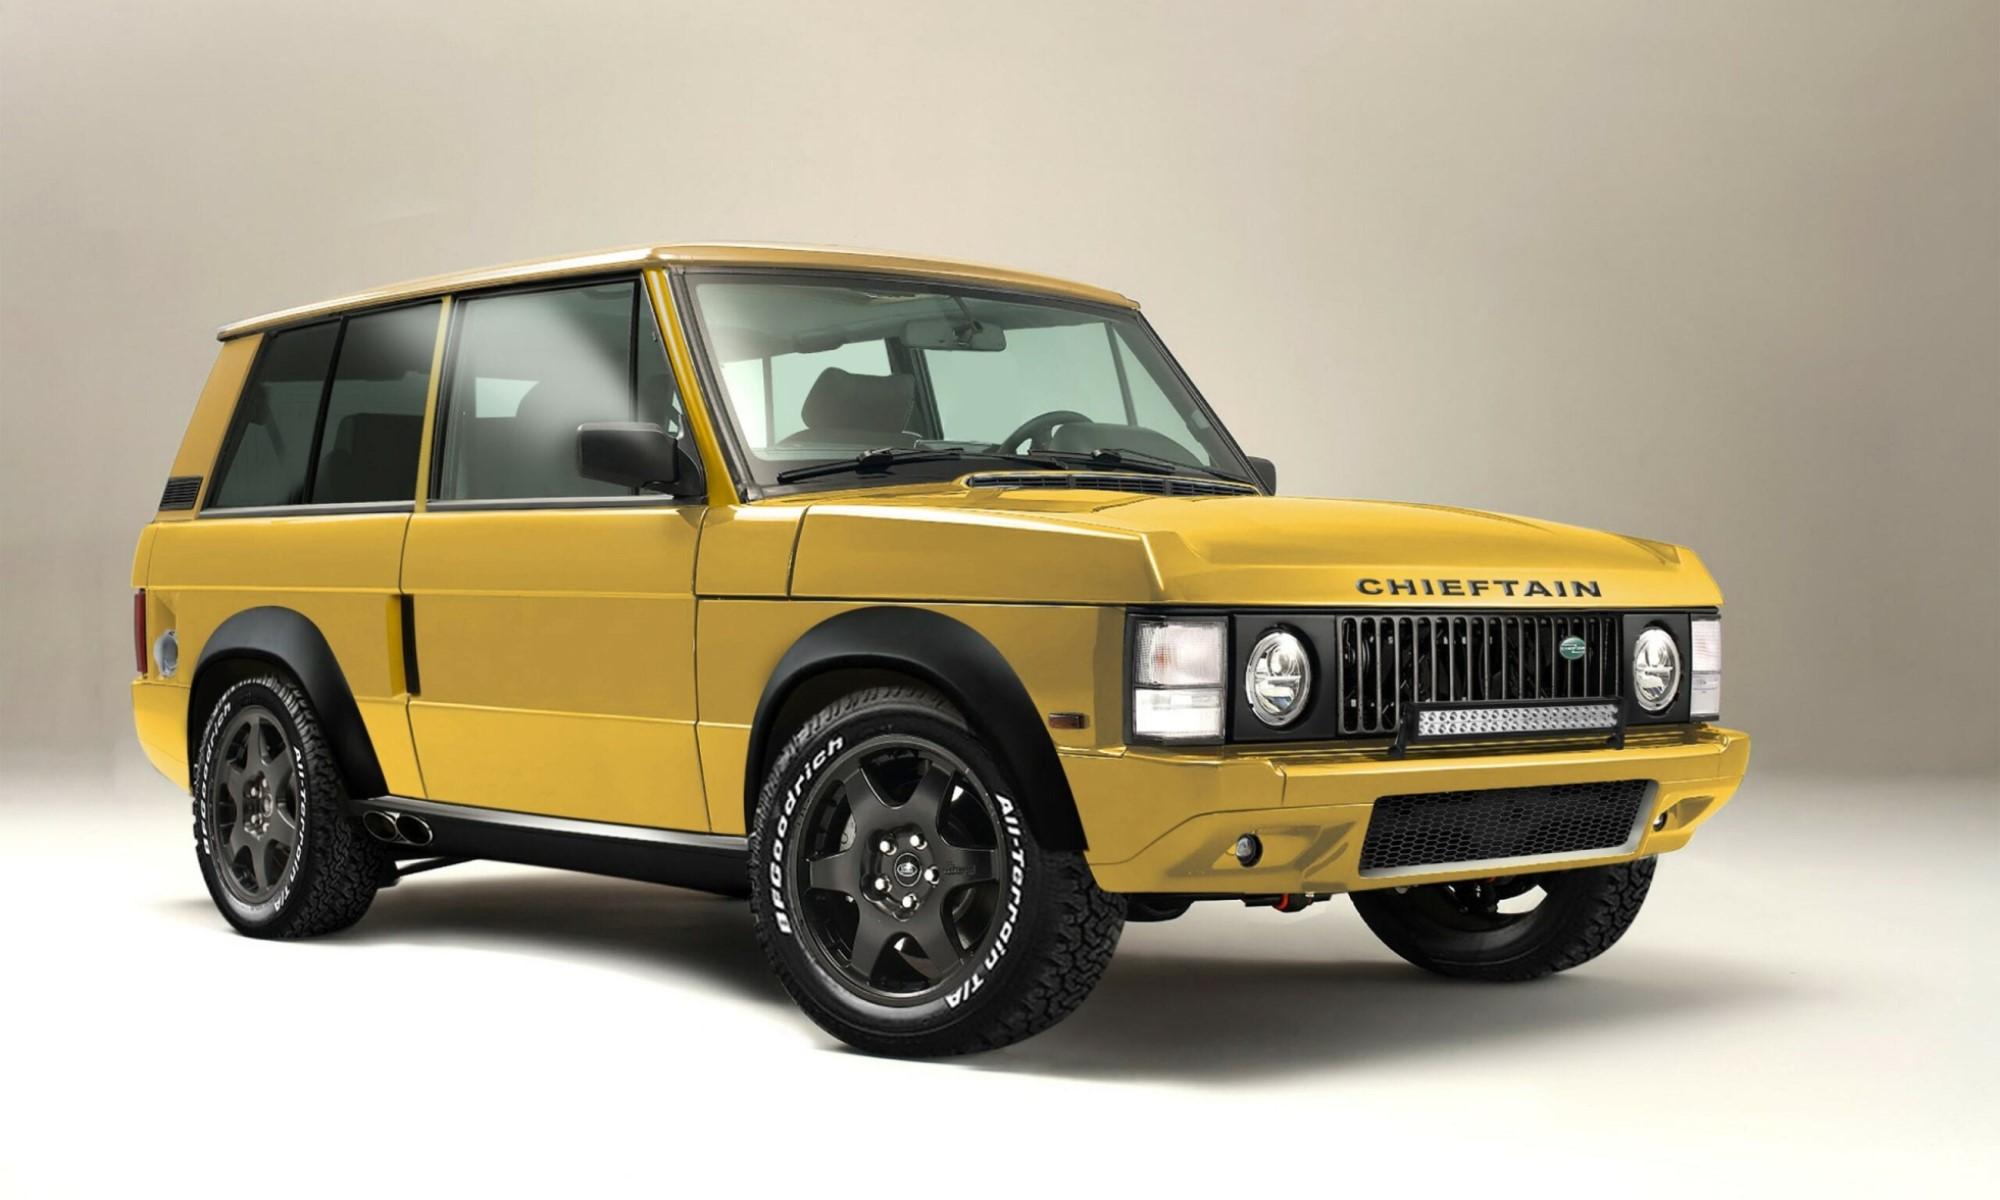 Chieftain Range Rover Classic